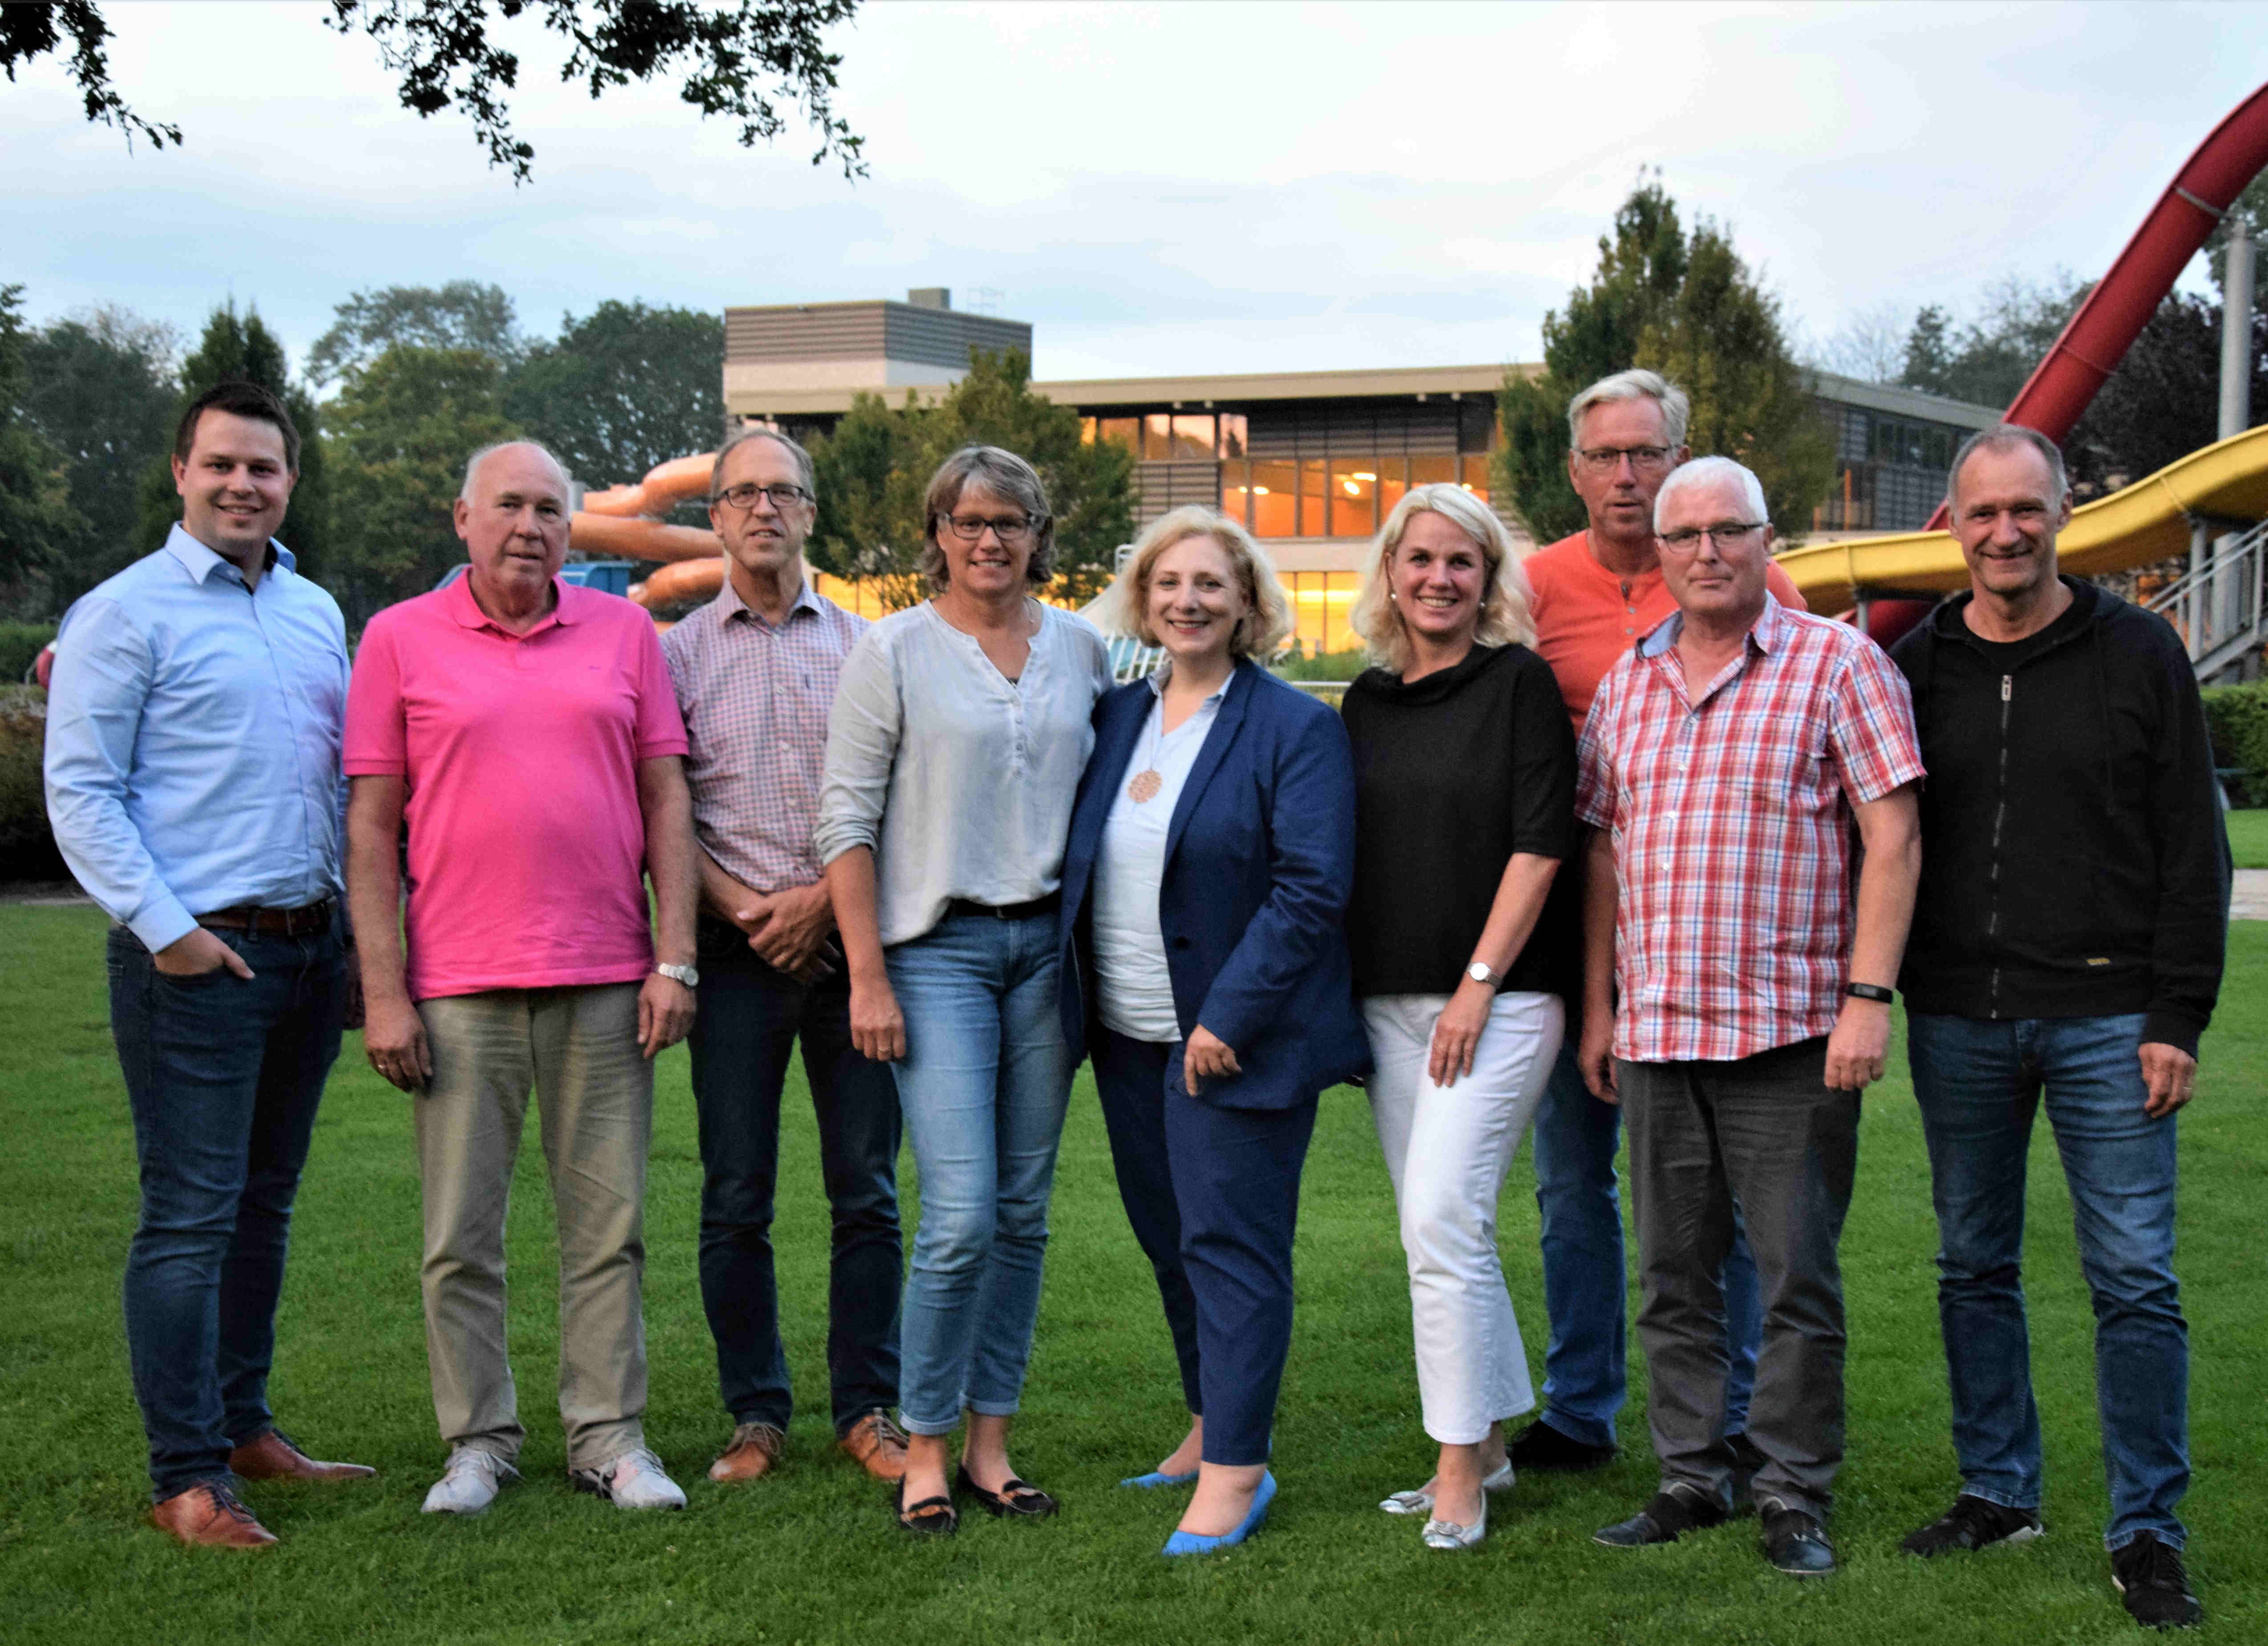 V.l.n.r.: Steffen Müller, Hartmut Schlichting, Detlef Rüger, Claudia Kern, Dr. Daniela De Ridder, Bettina Mundt, Herbert Egbers, Willi Nibbrig, Bernhard Portheine